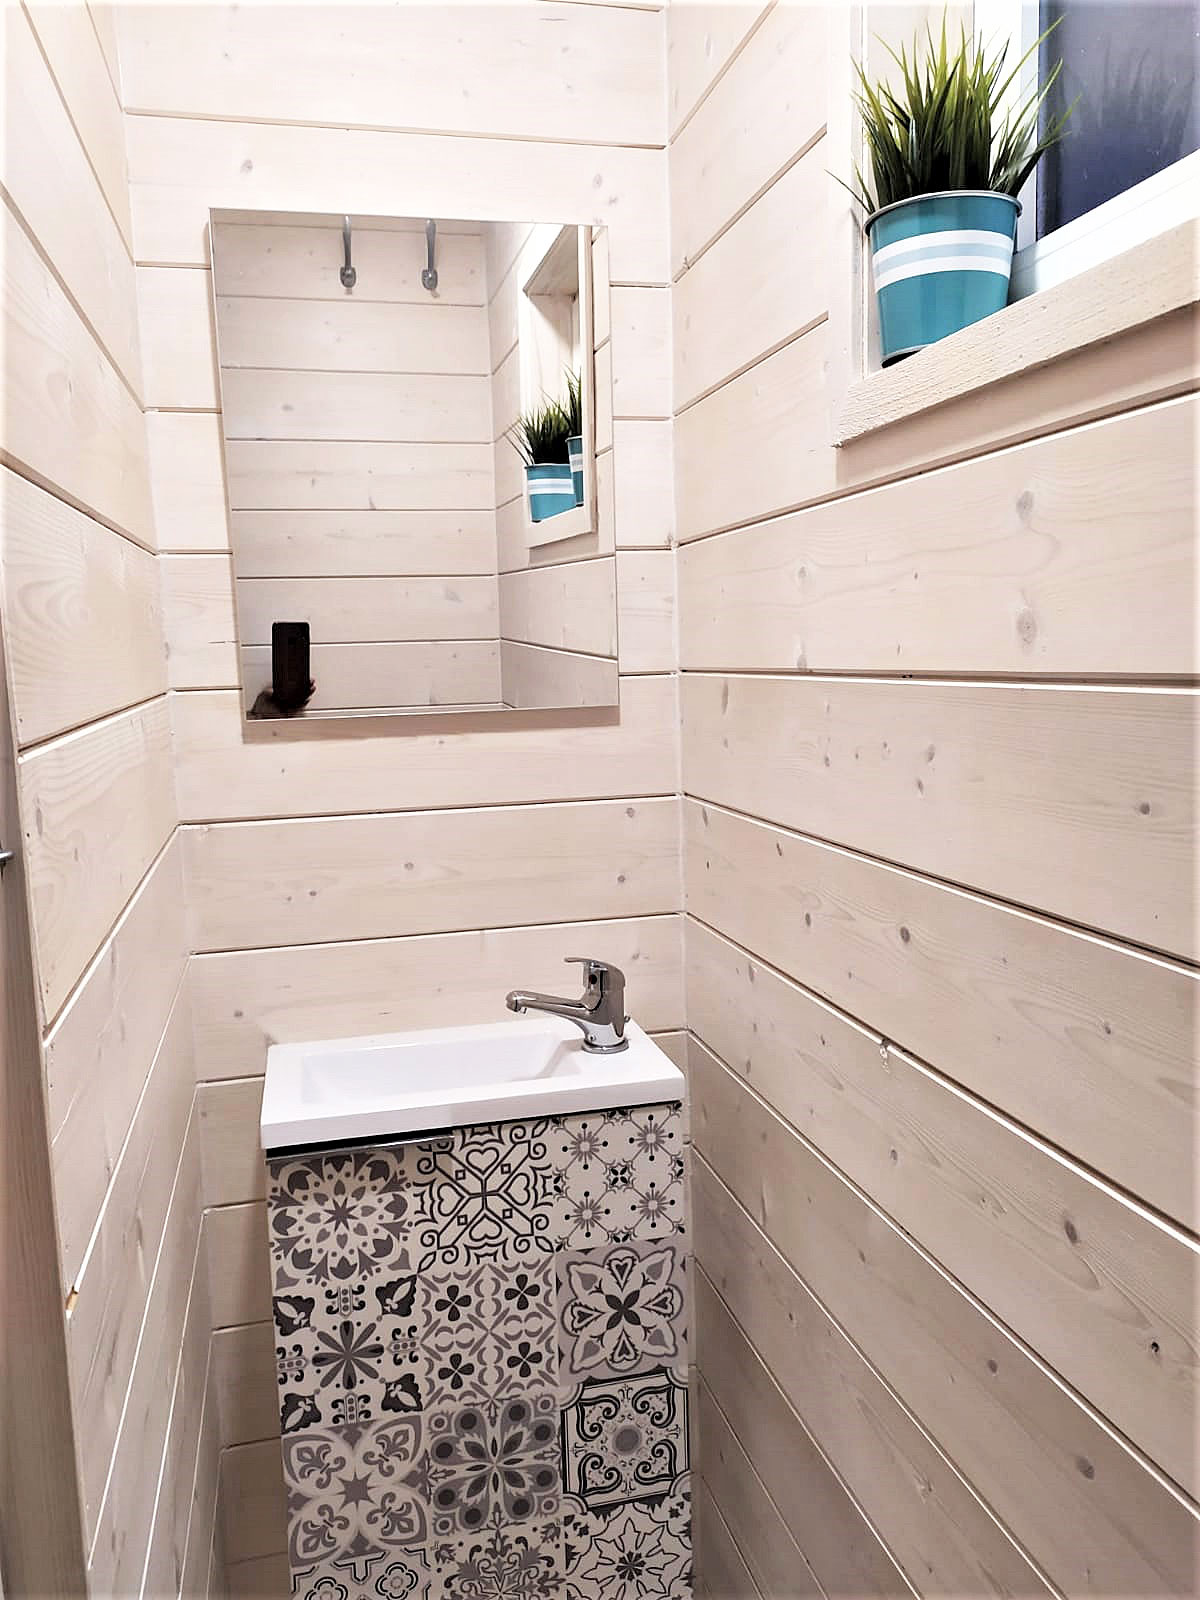 Interior caseta madera habitable 19m2 Caseta Living